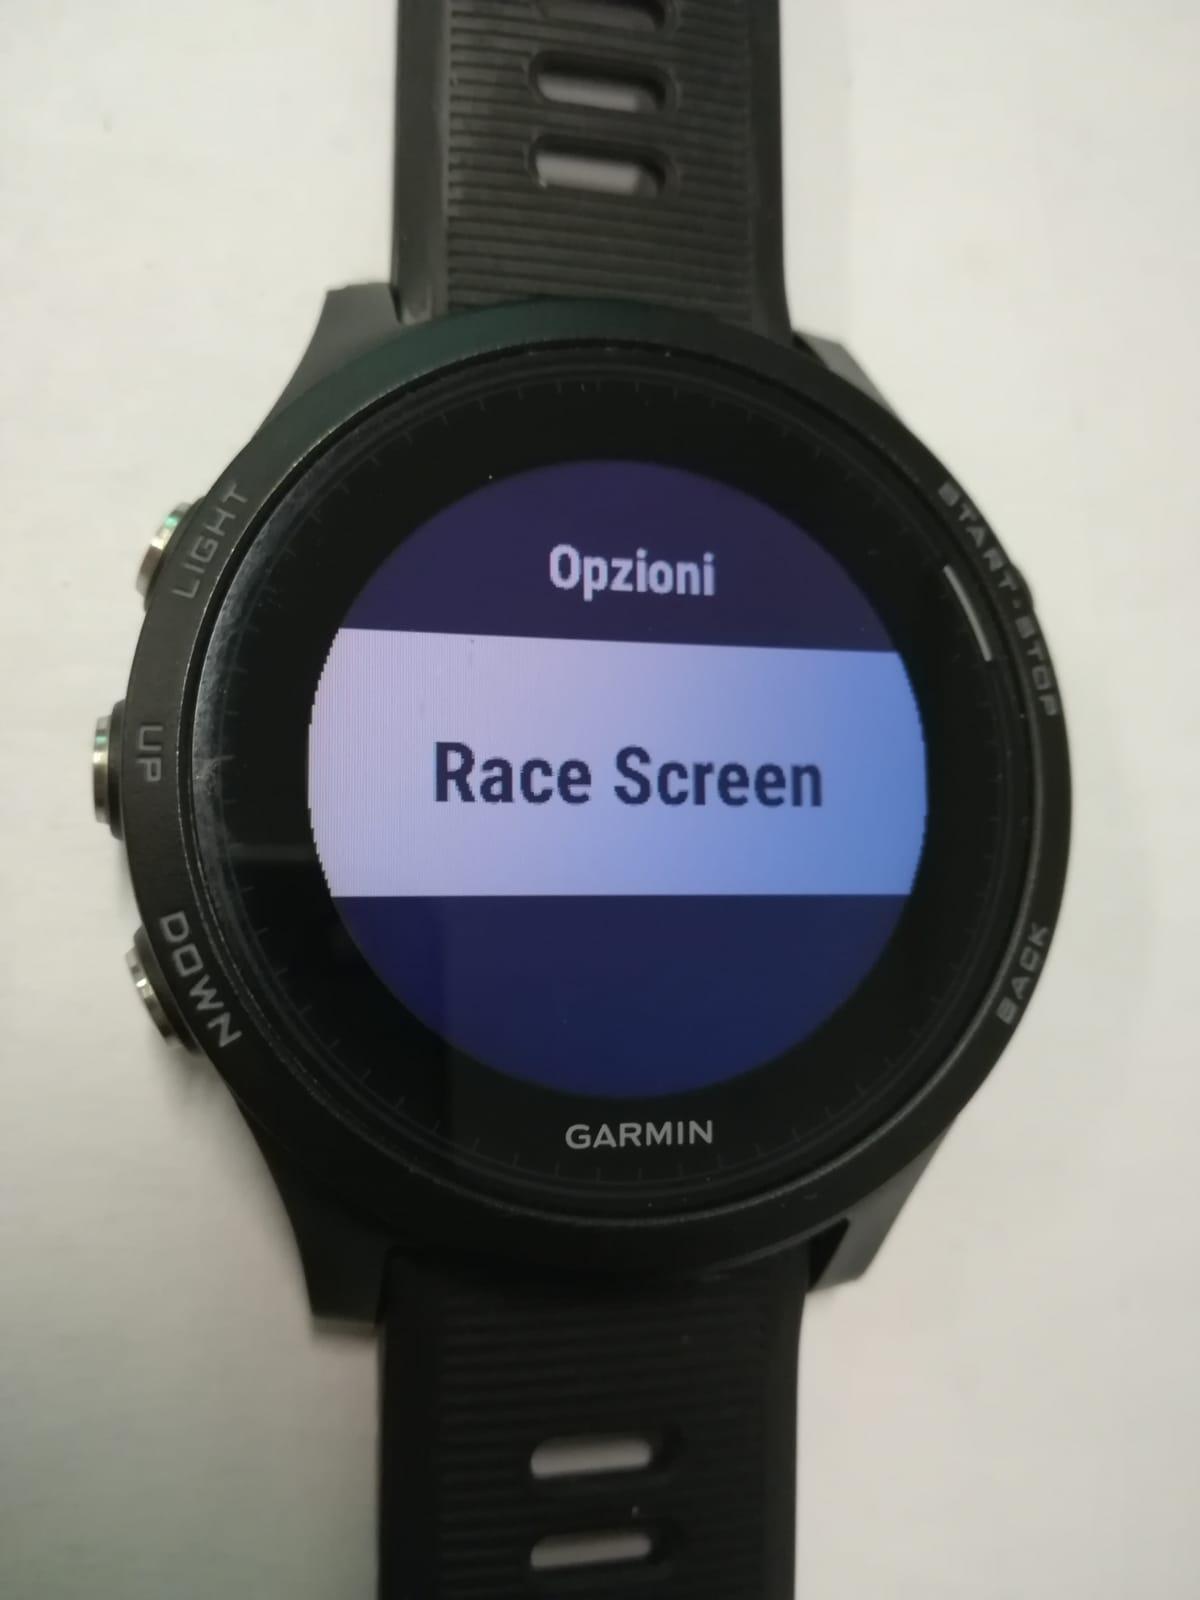 Race Screen